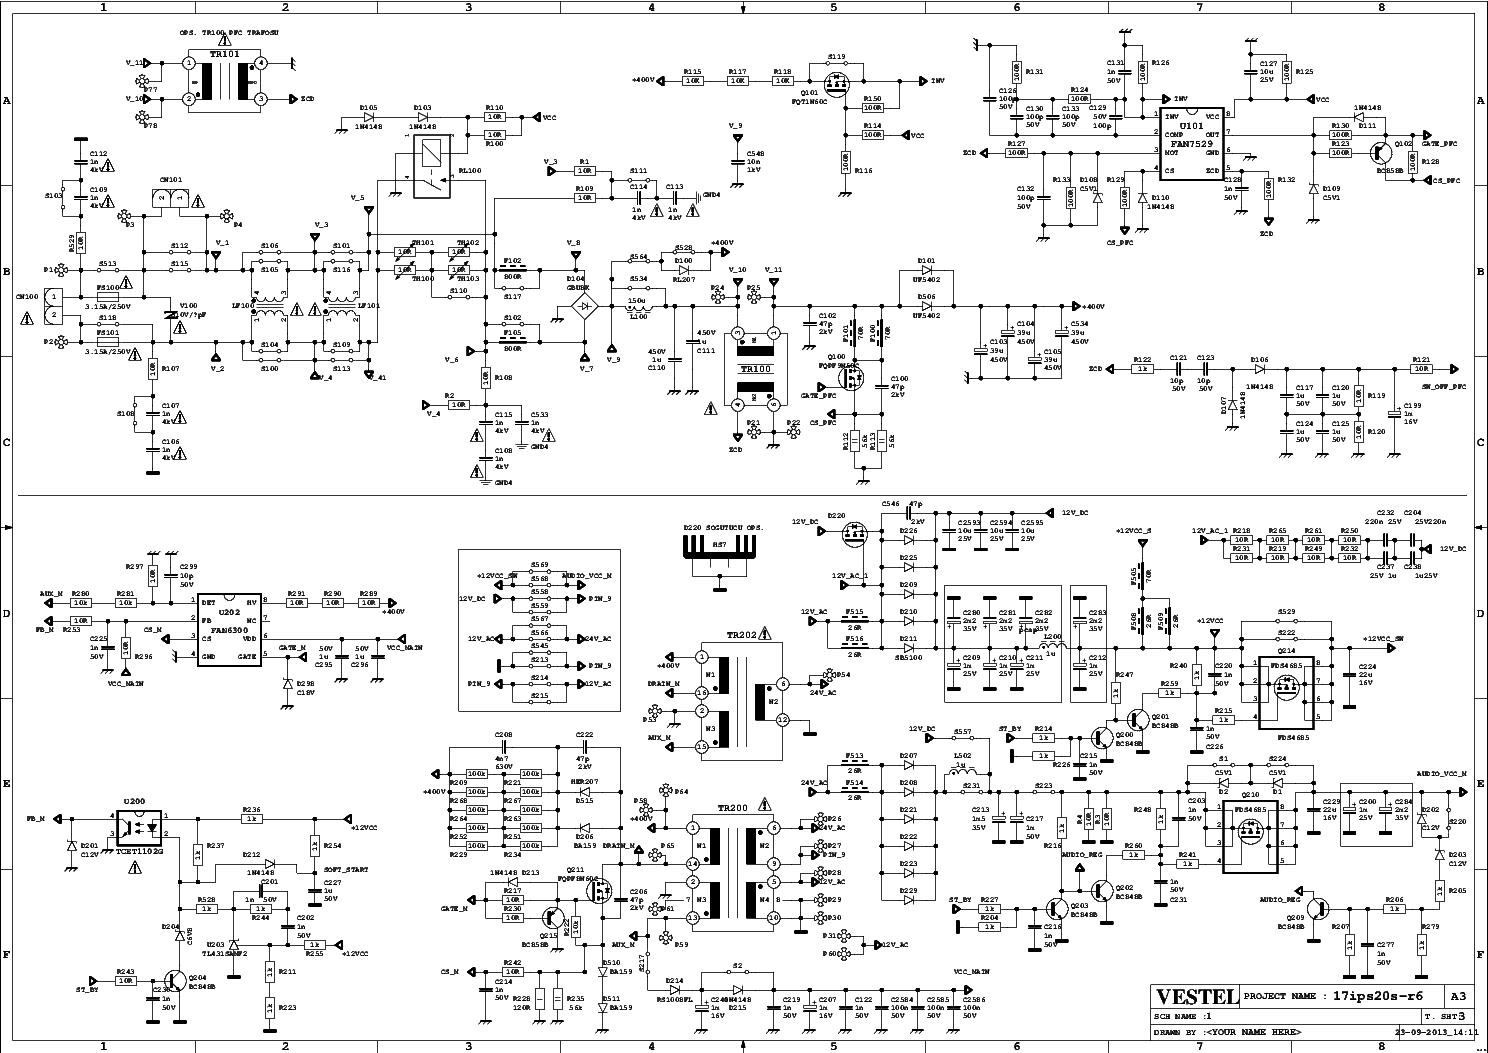 17pw25 4 Circuit Diagram Explained Wiring Diagrams 17pw26 Symbols U2022 Labeled